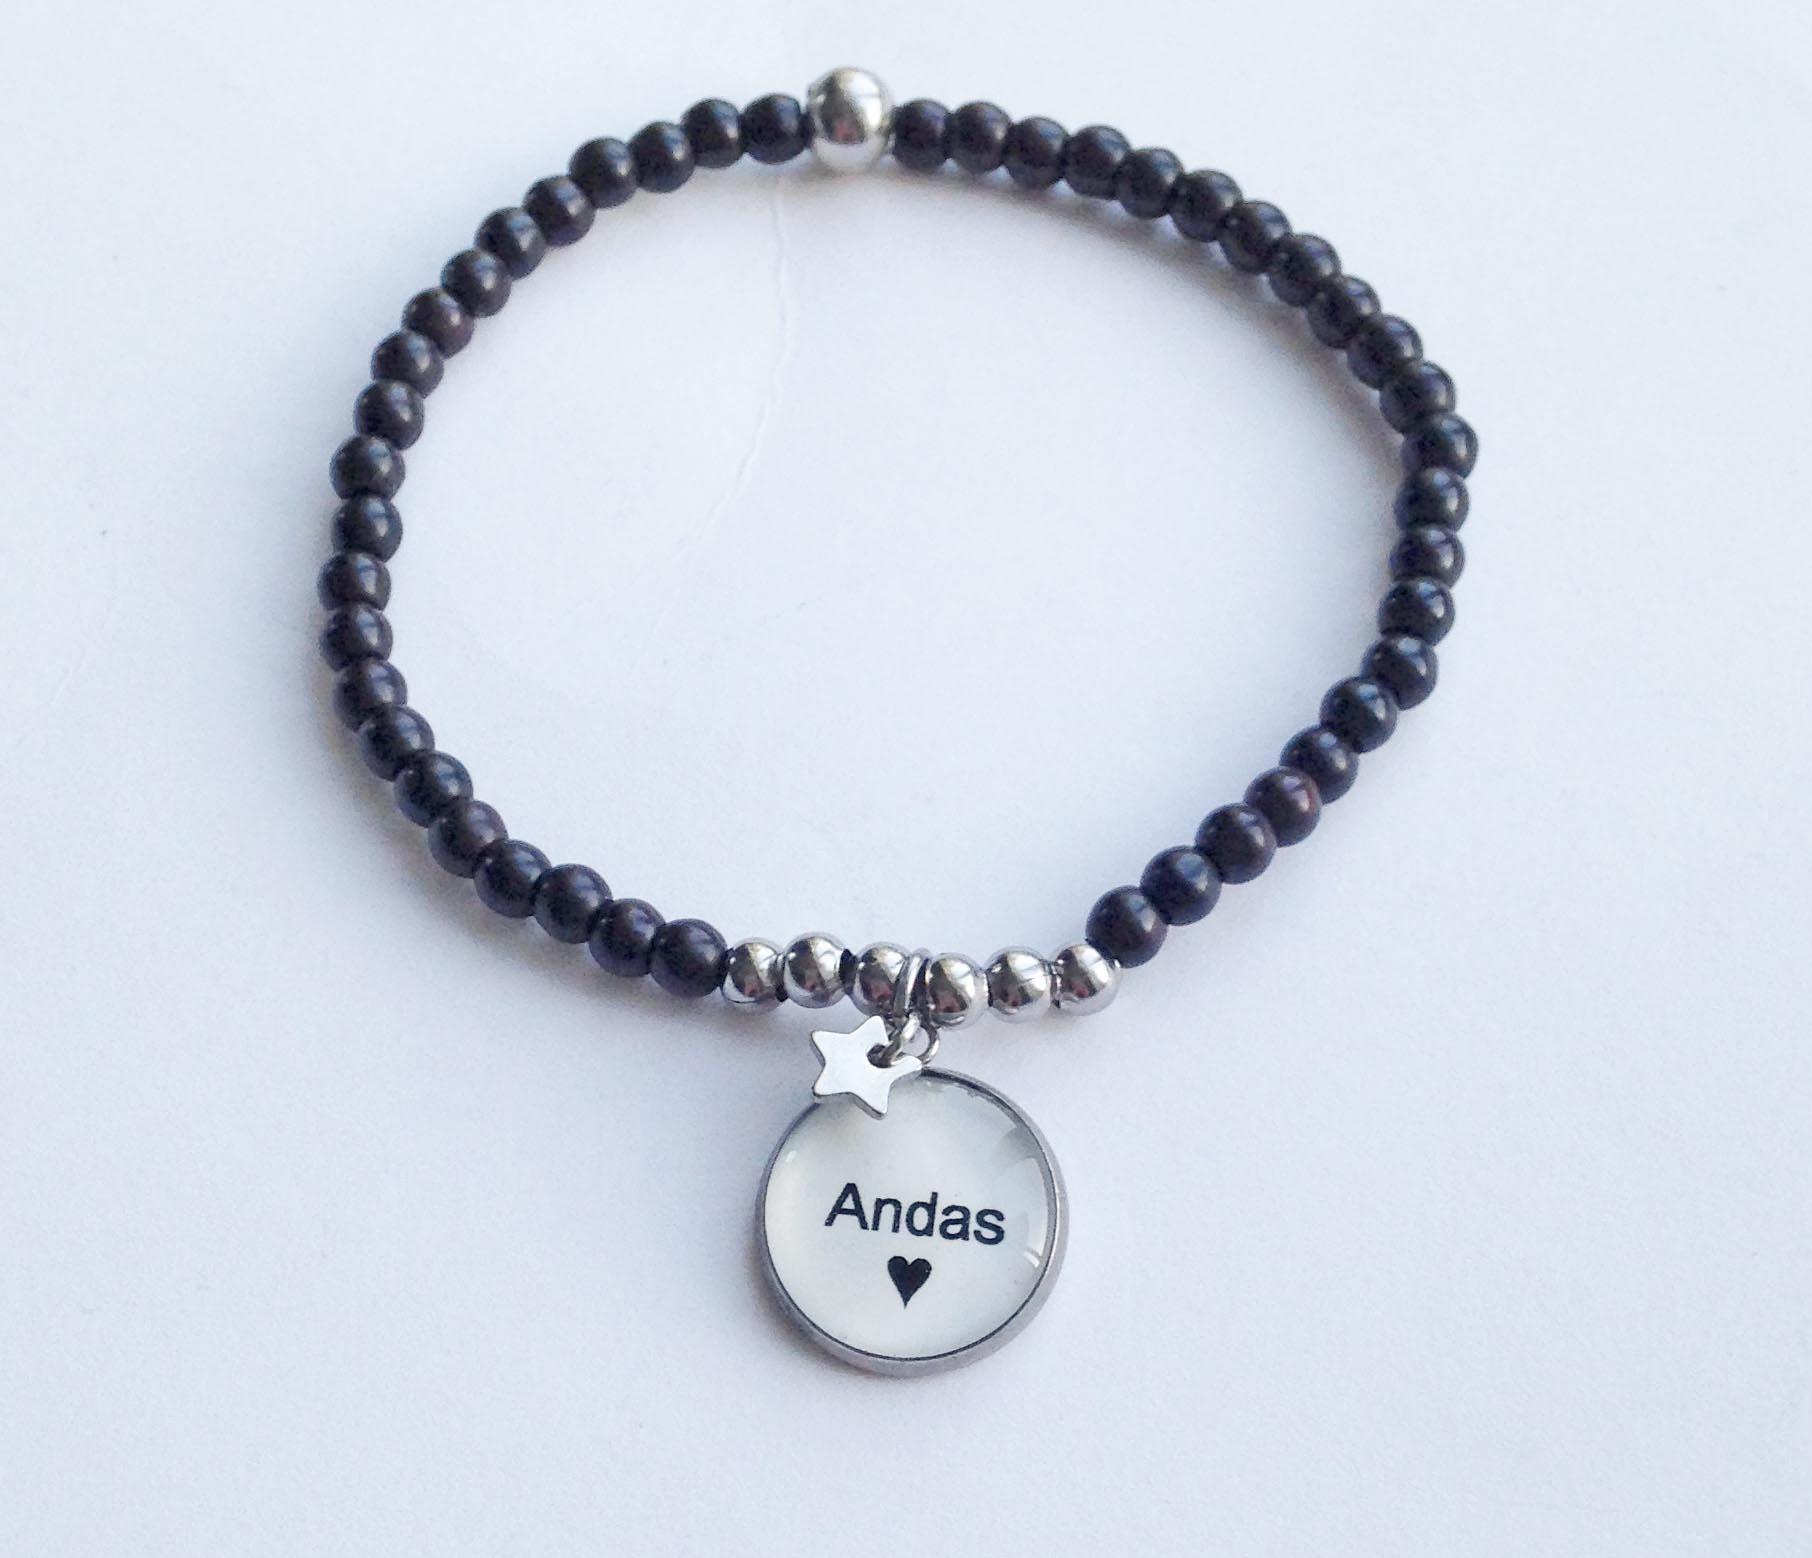 Andas_svart